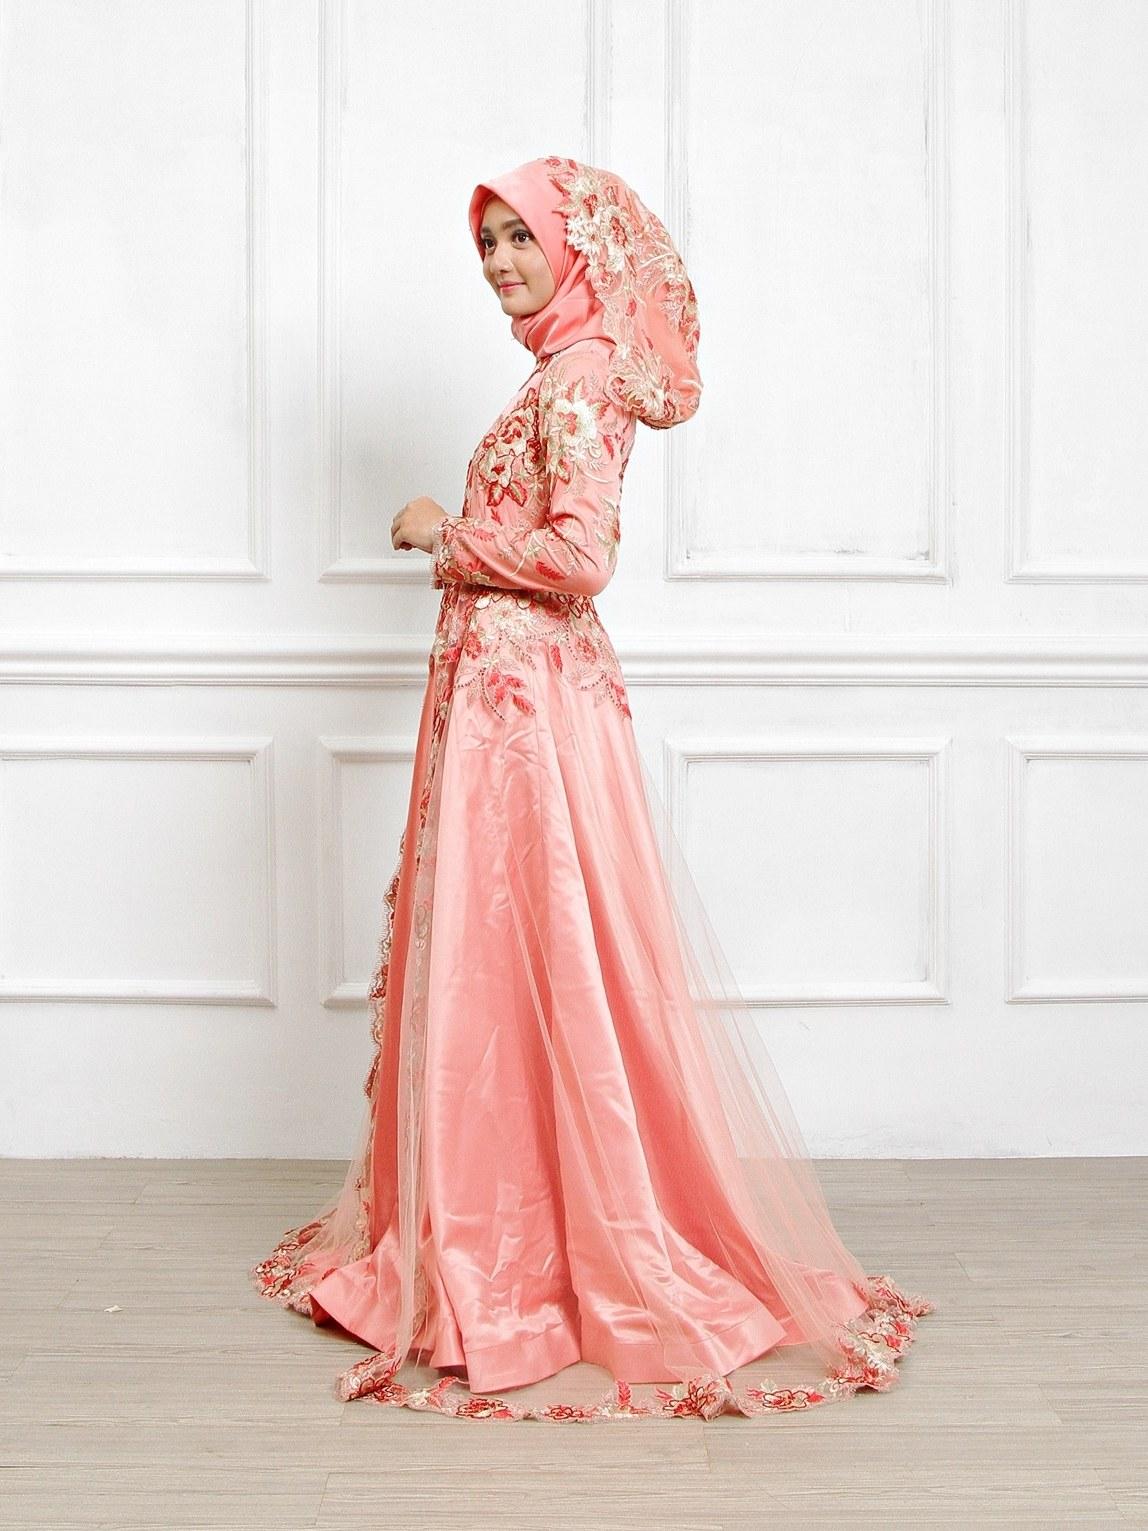 Bentuk Sewa Gaun Pengantin Muslimah Di Bekasi Ffdn Gaun Pengantin Muslimah Dress Muslim Pungky Rumah Jahit